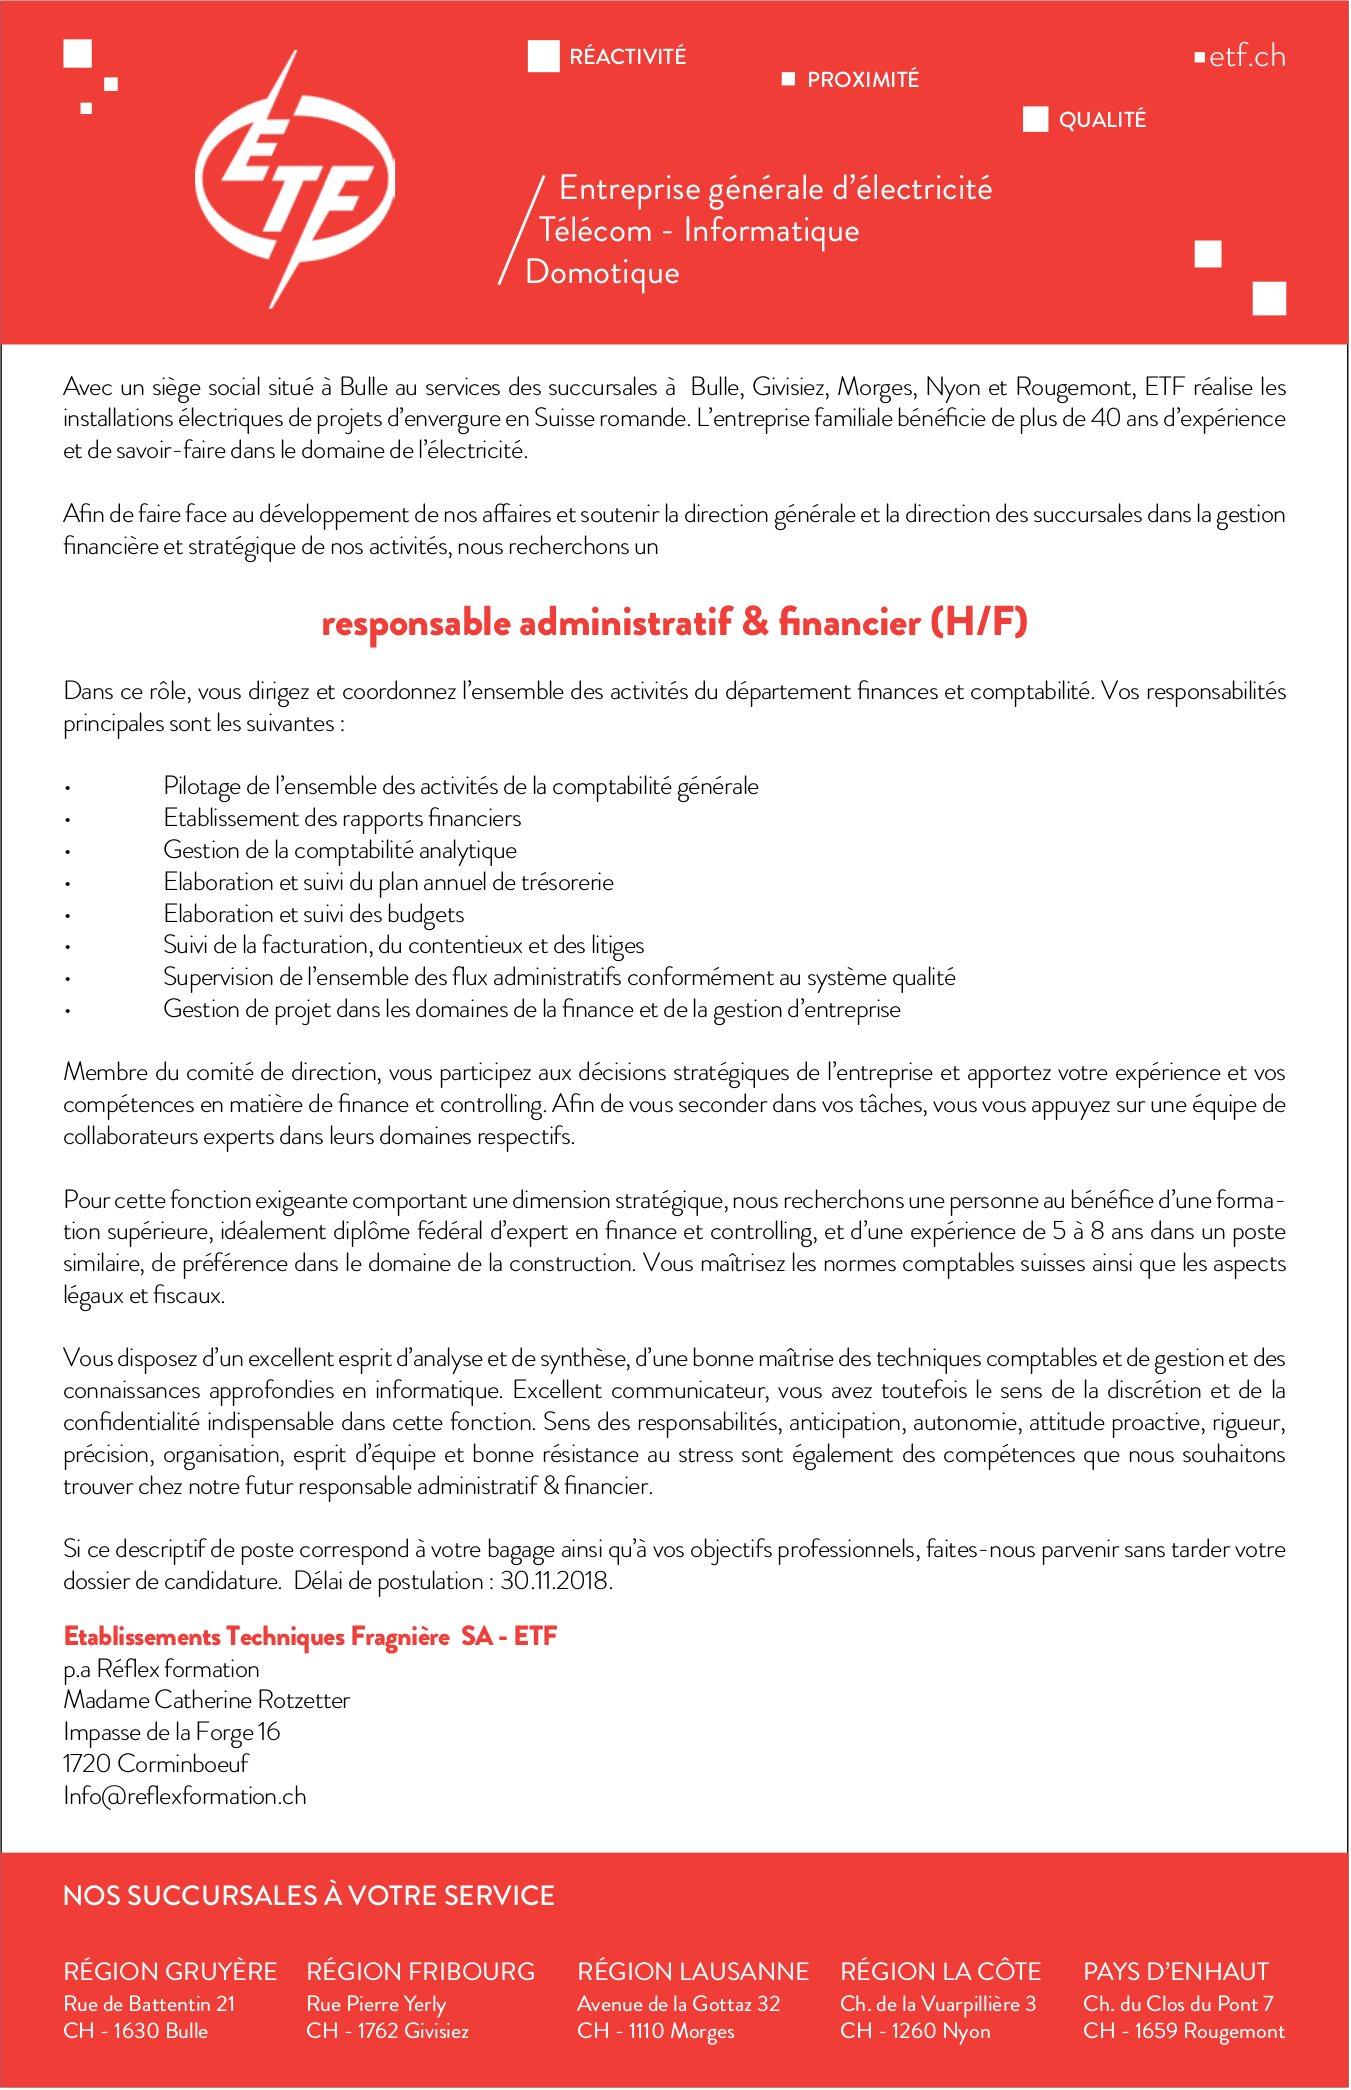 Responsable administratif & financier (H/F), ETF, Bulle, recherché